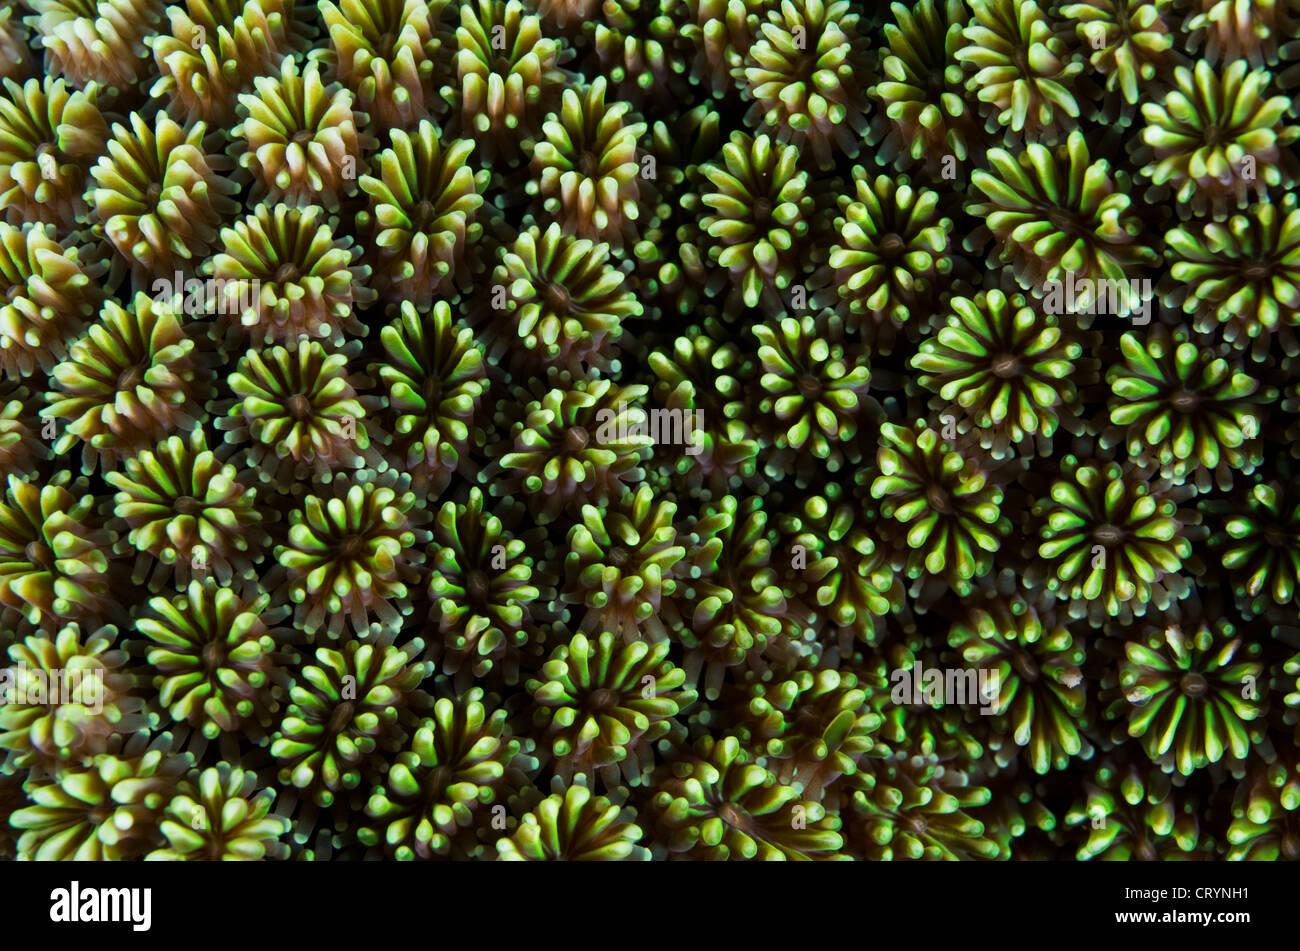 Coral reef, Okinawa, Japan - Stock Image